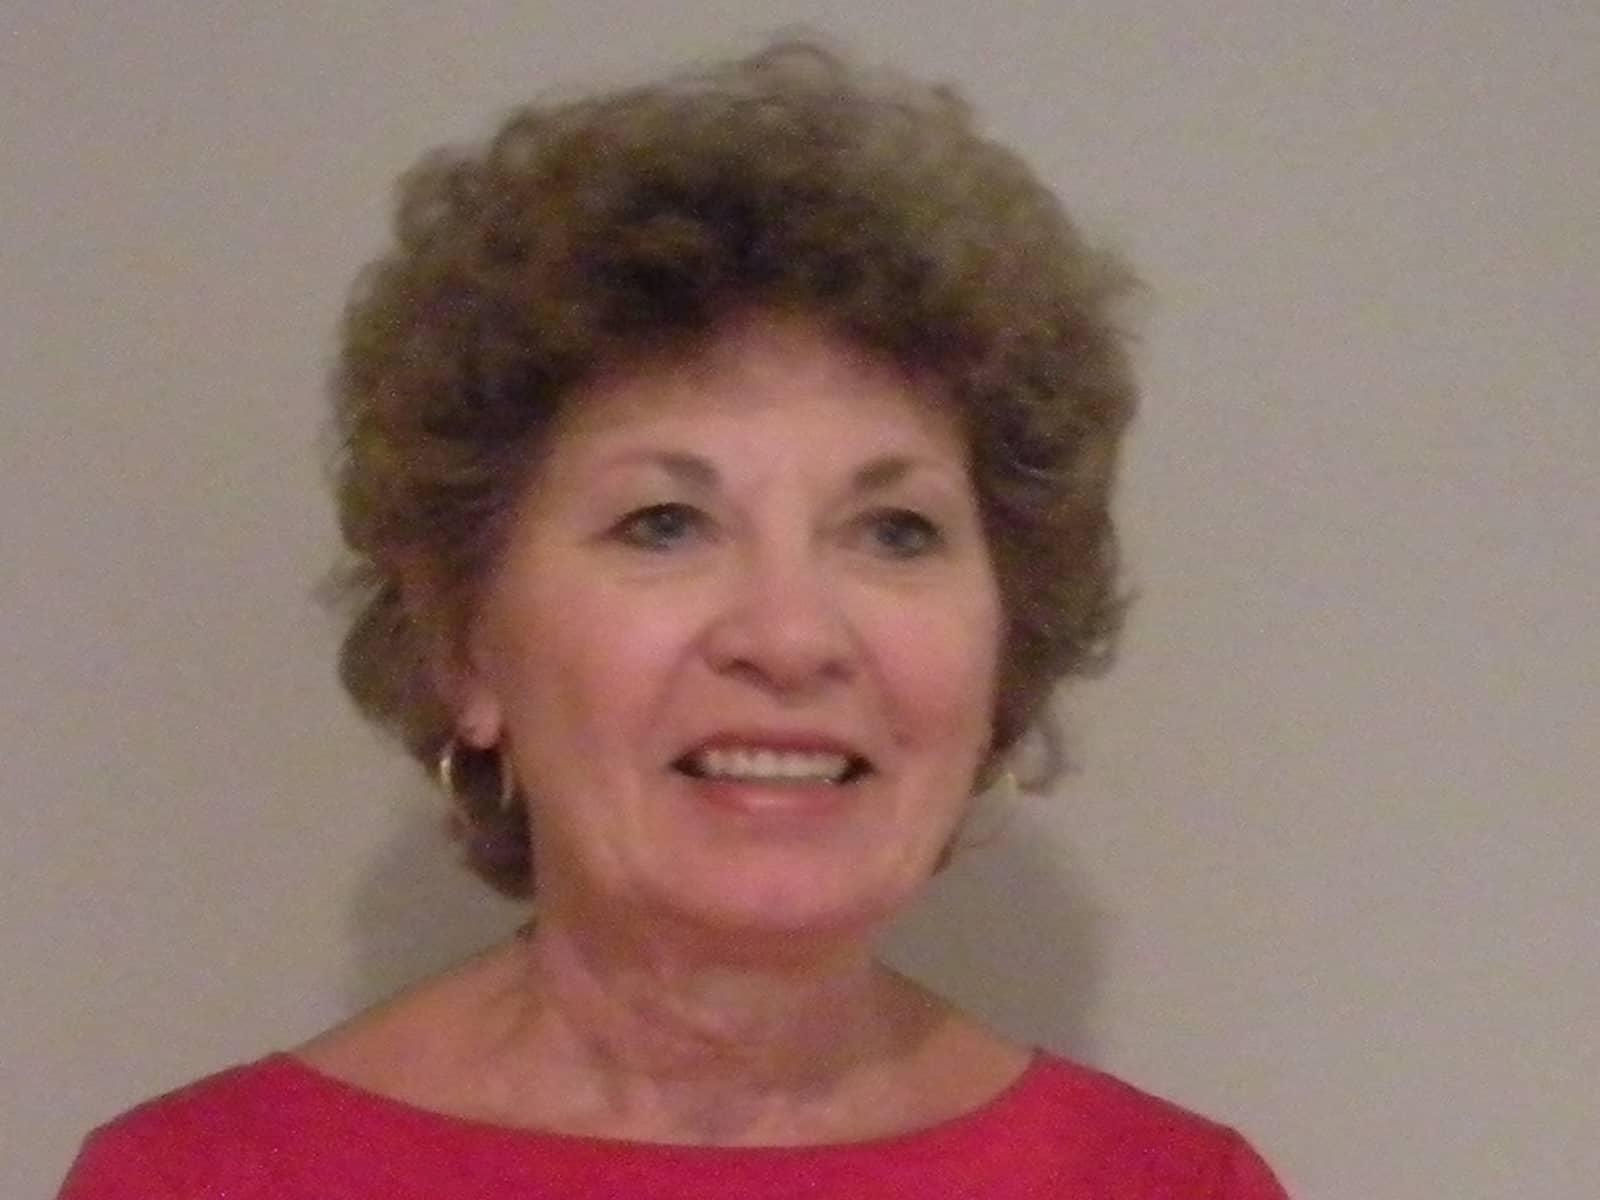 Nancy from Saskatoon, Saskatchewan, Canada